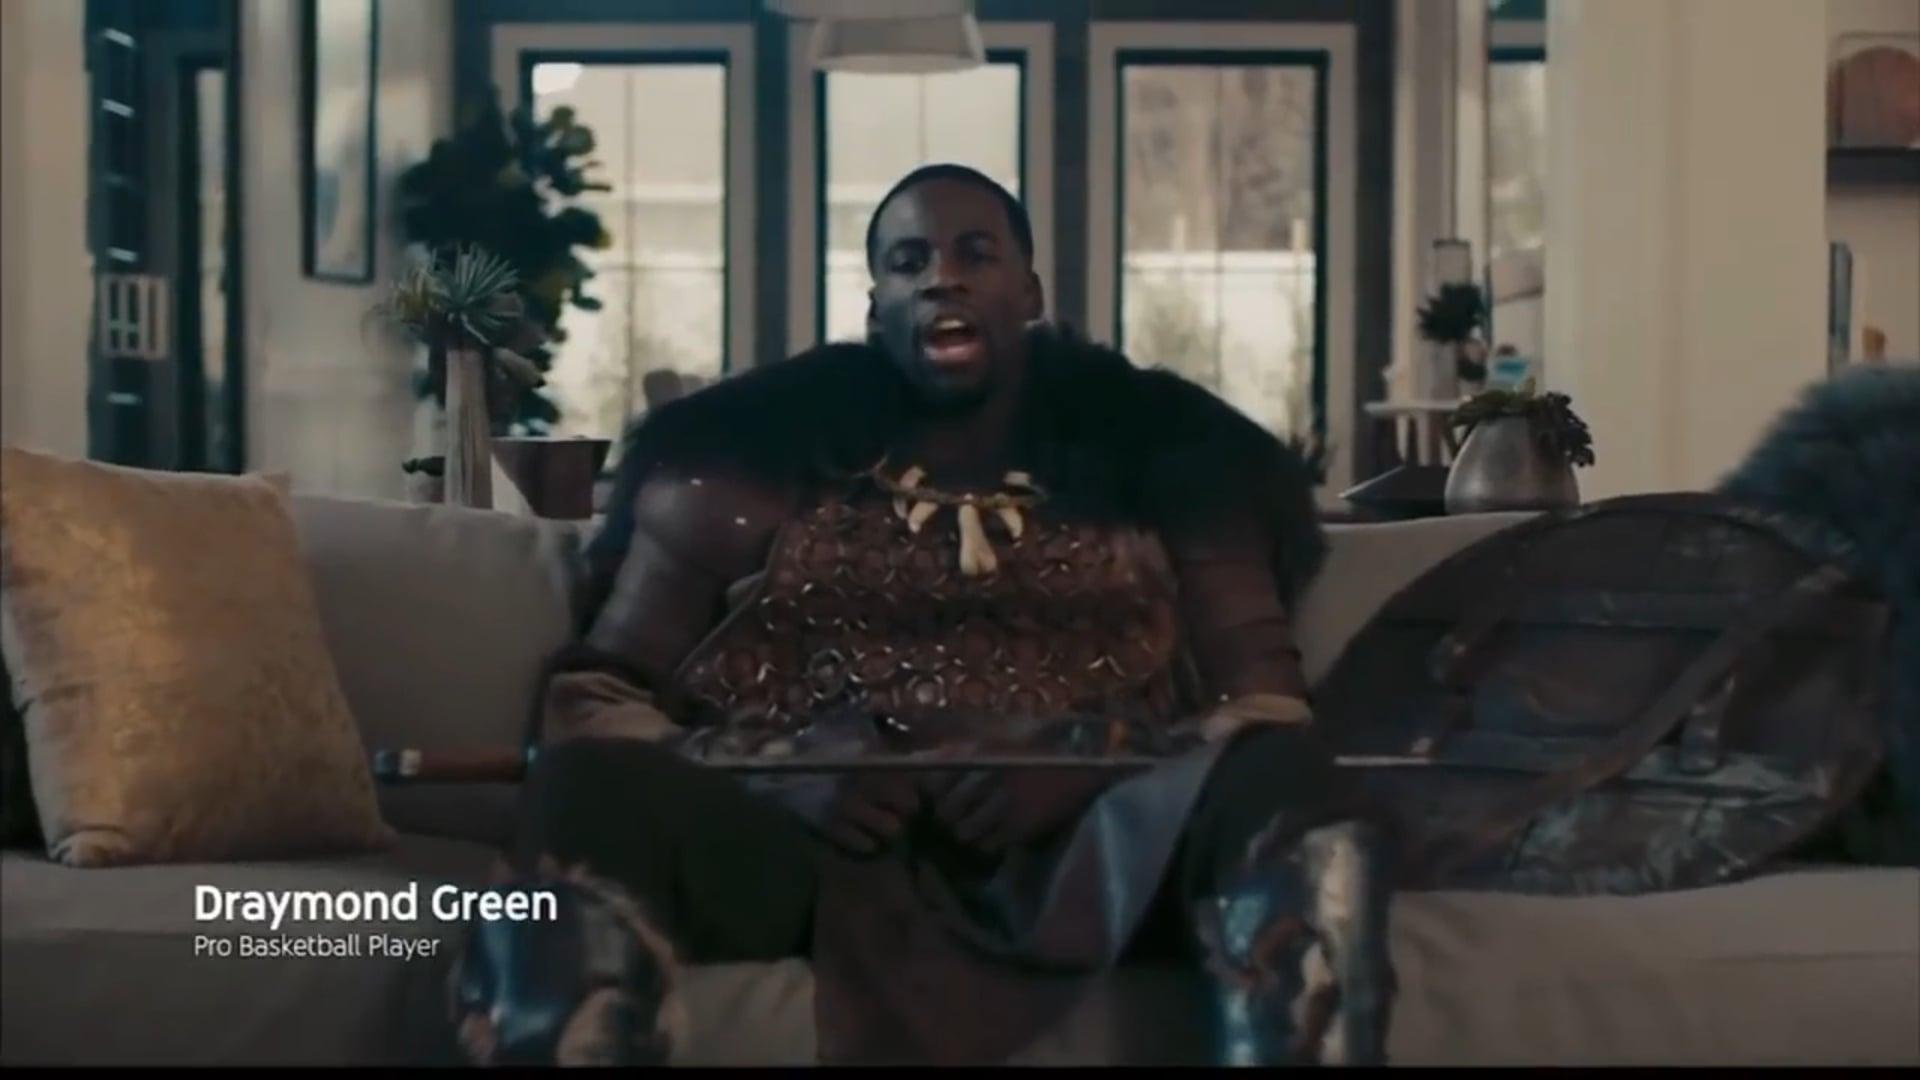 Draymond Green in YouTubeTV commercial.mp4